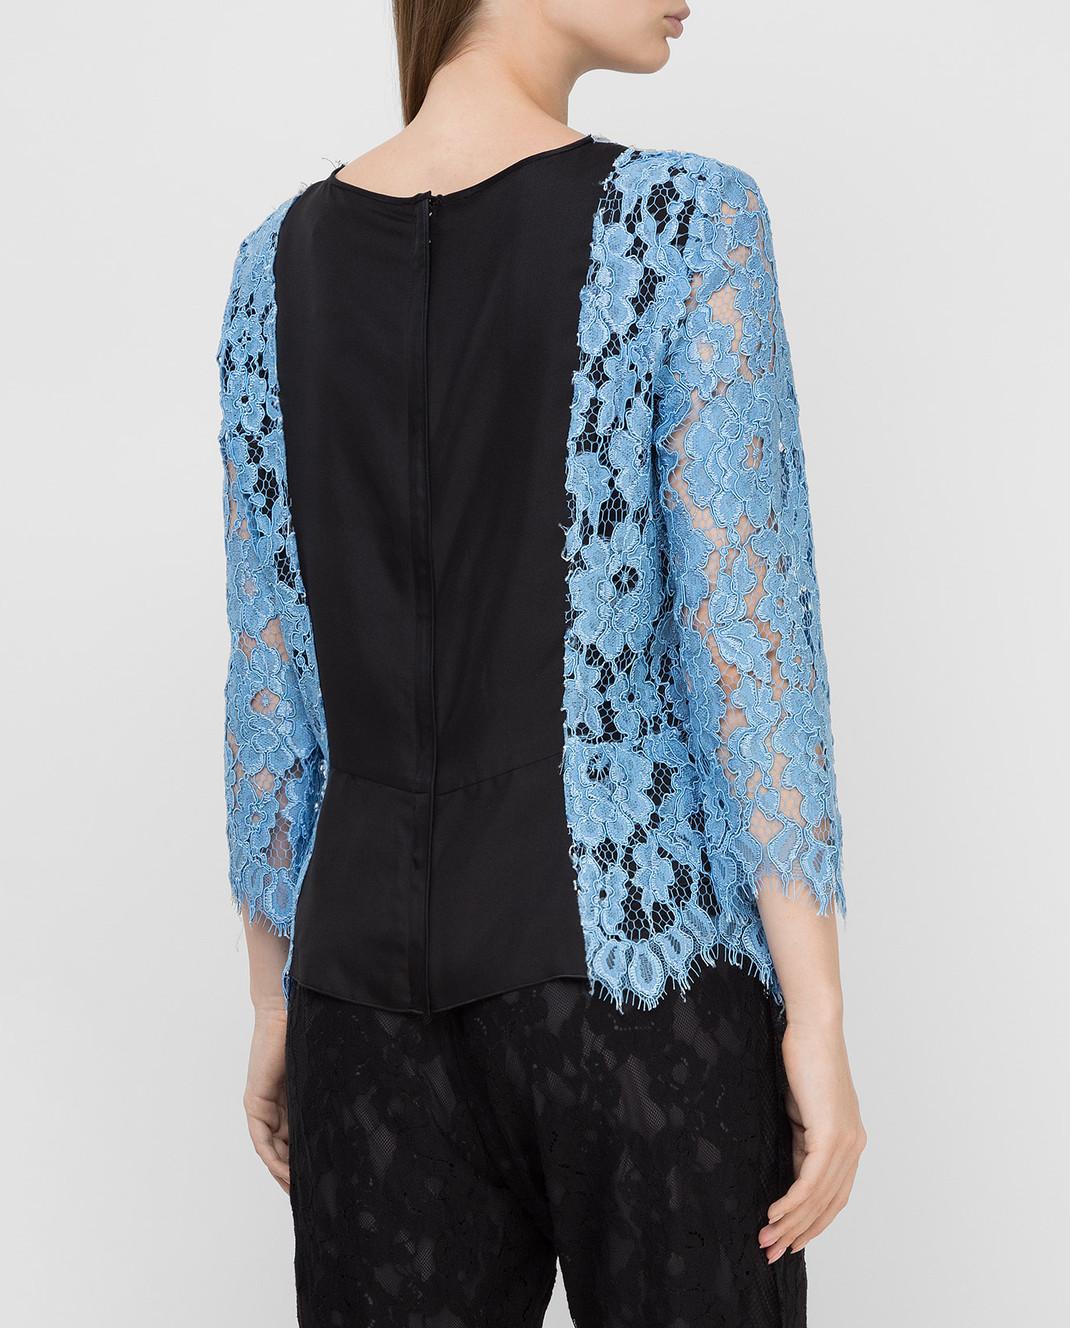 Marc Jacobs Голубая блуза M4005733 изображение 4